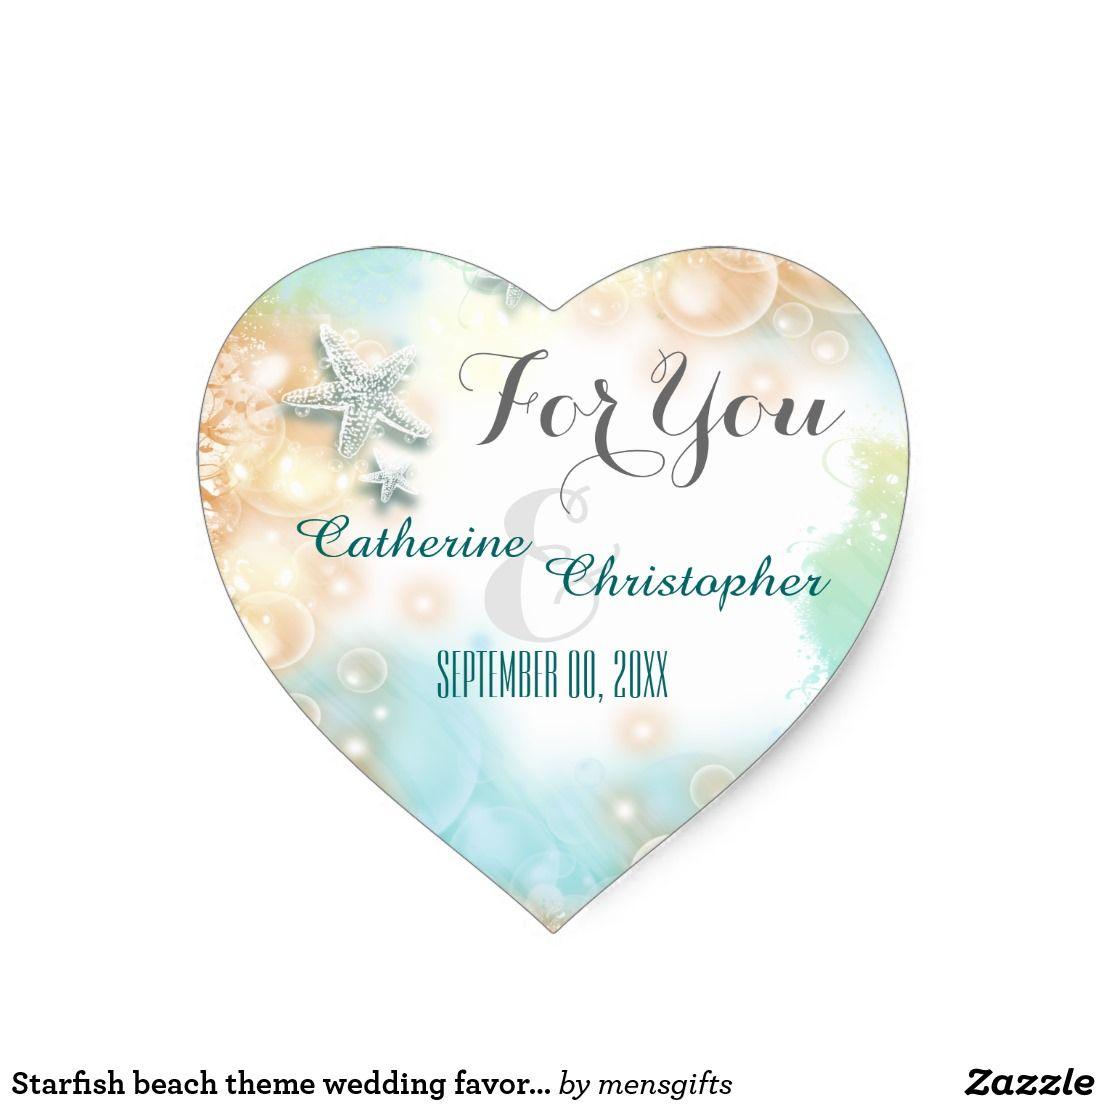 Starfish beach theme wedding favor \